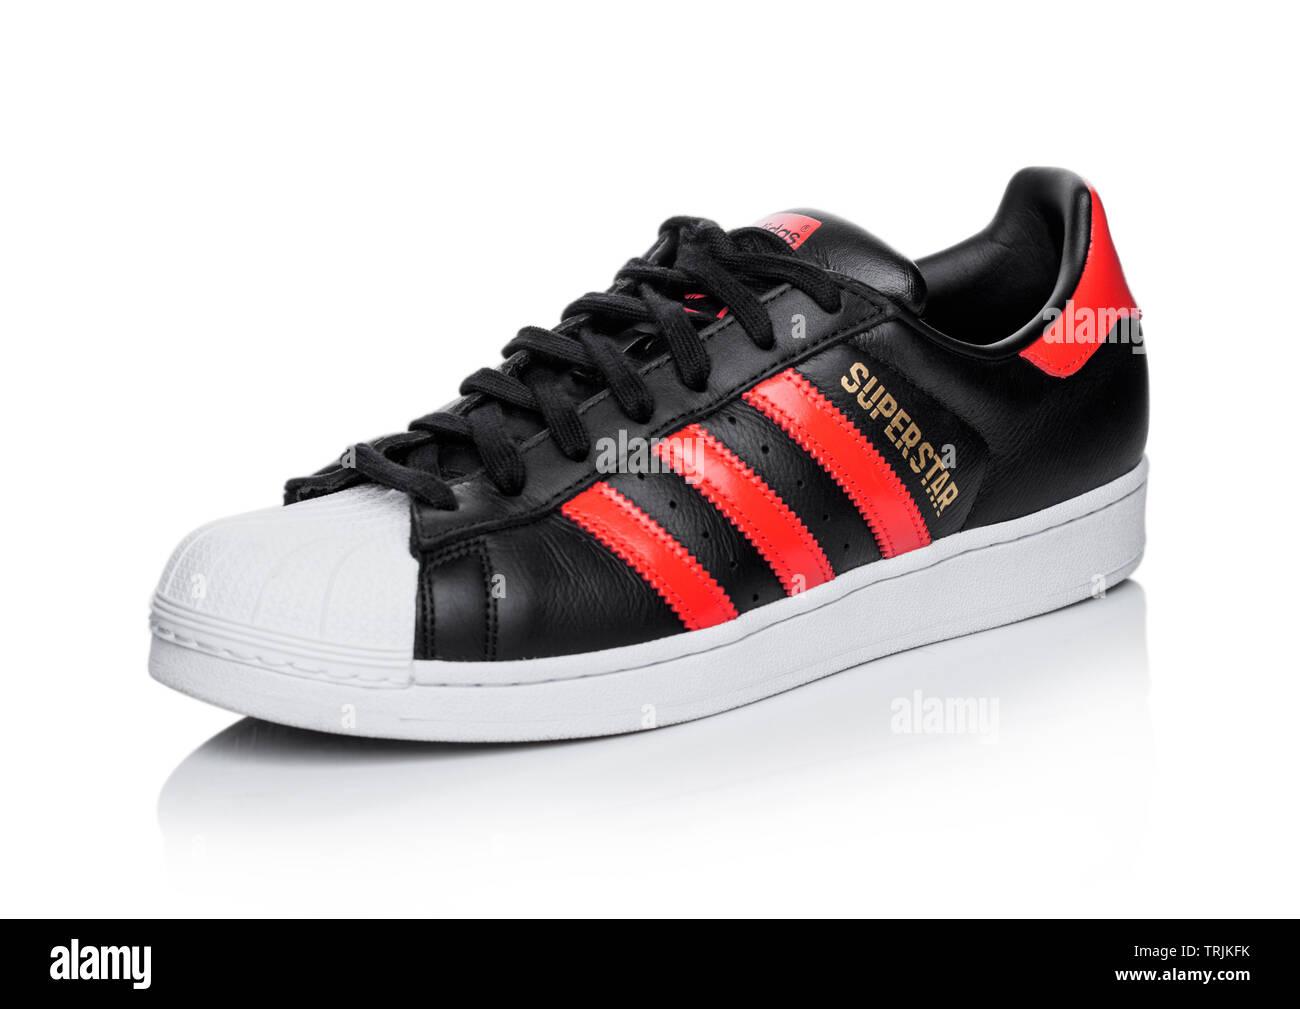 Rot Weißes Adidas Top Stockfotos & Rot Weißes Adidas Top